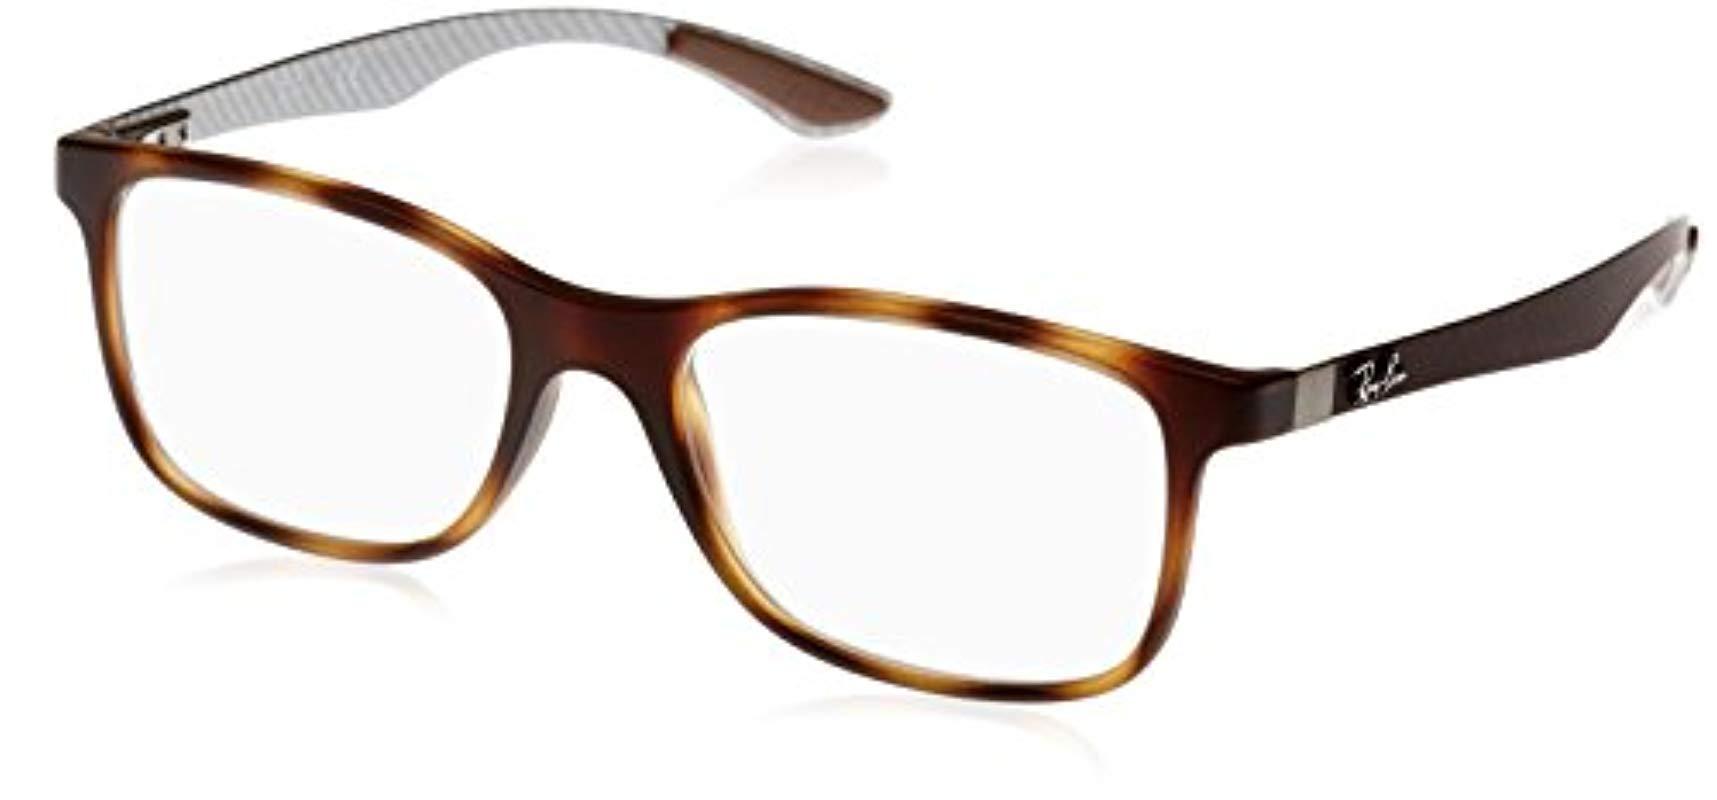 b474fd9b07 Ray-Ban. Men s 0rx 8903 5200 53 Optical Frames ...